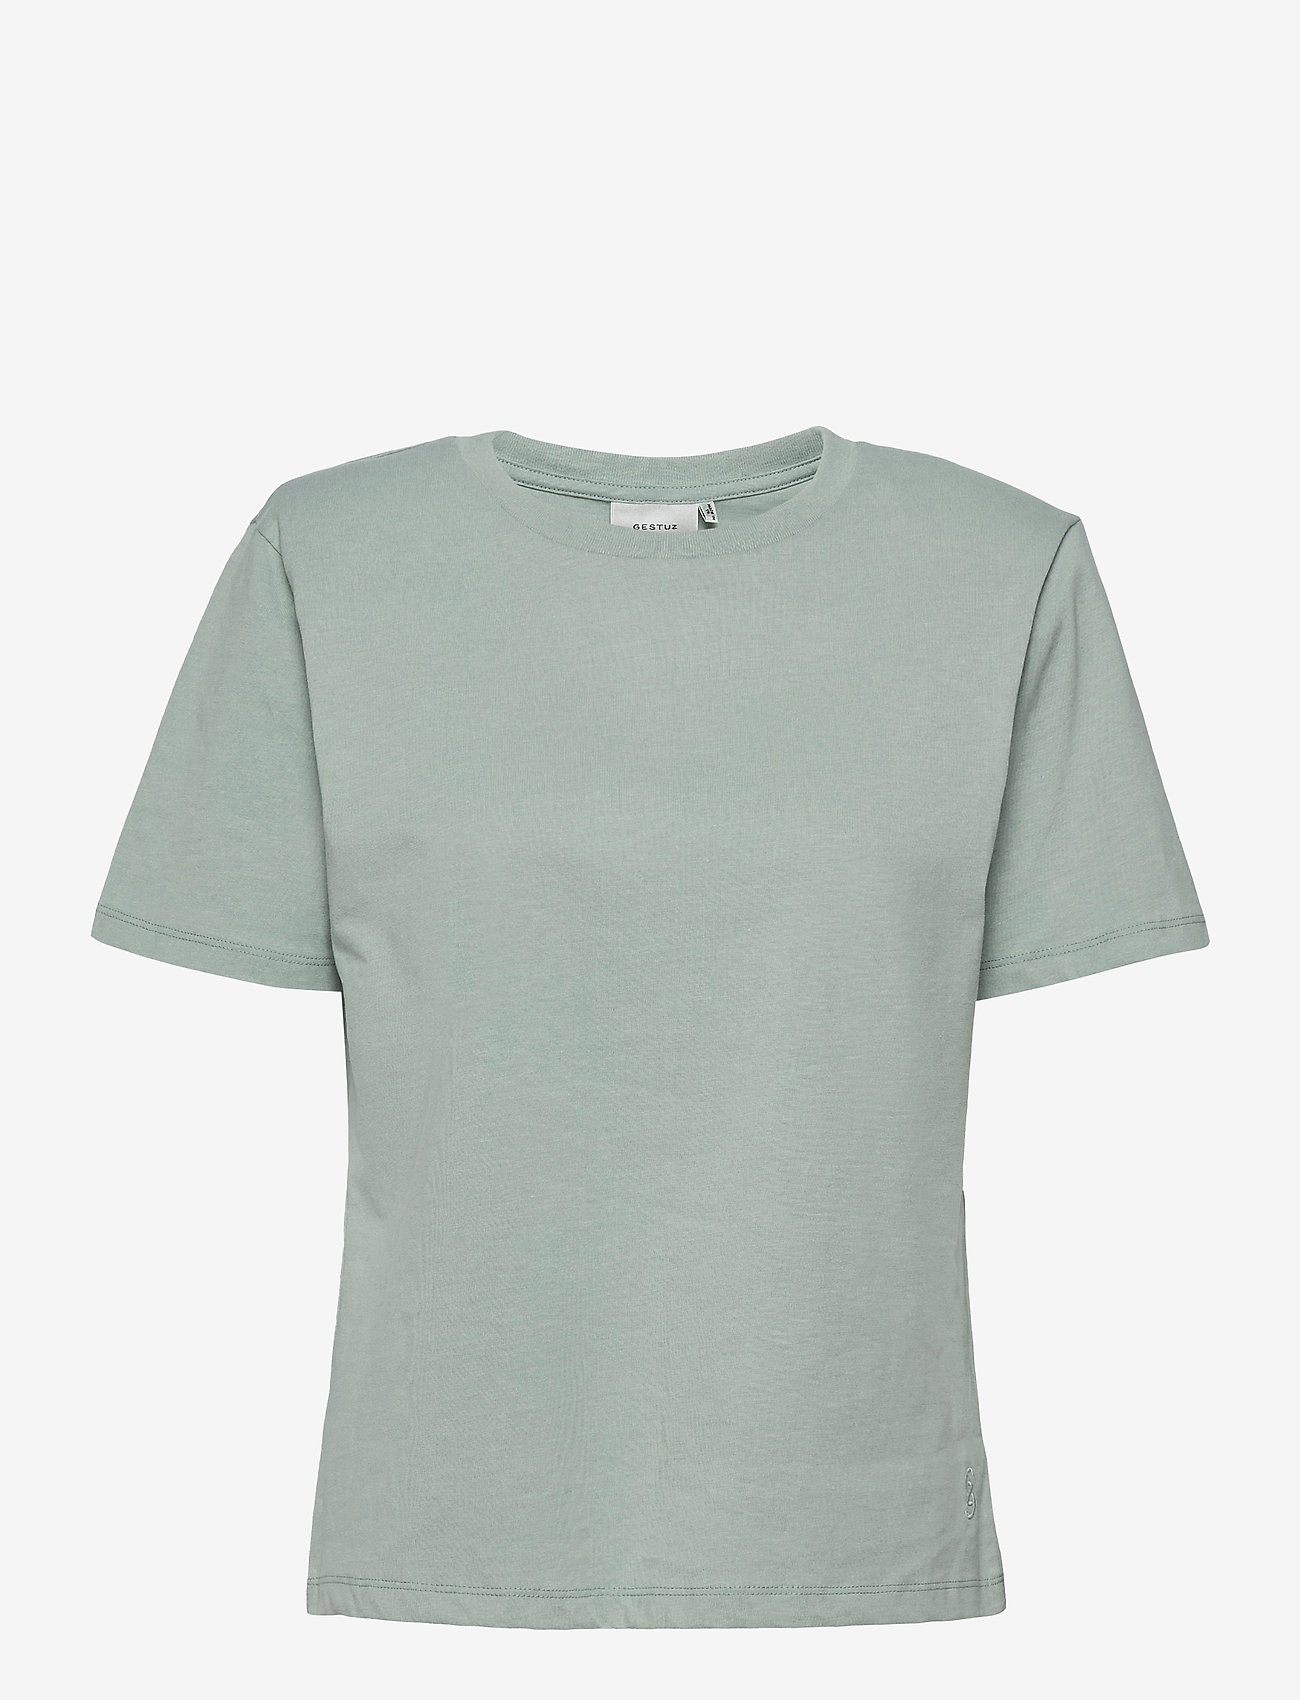 Gestuz - JoryGZ tee - t-shirts - slate gray - 1